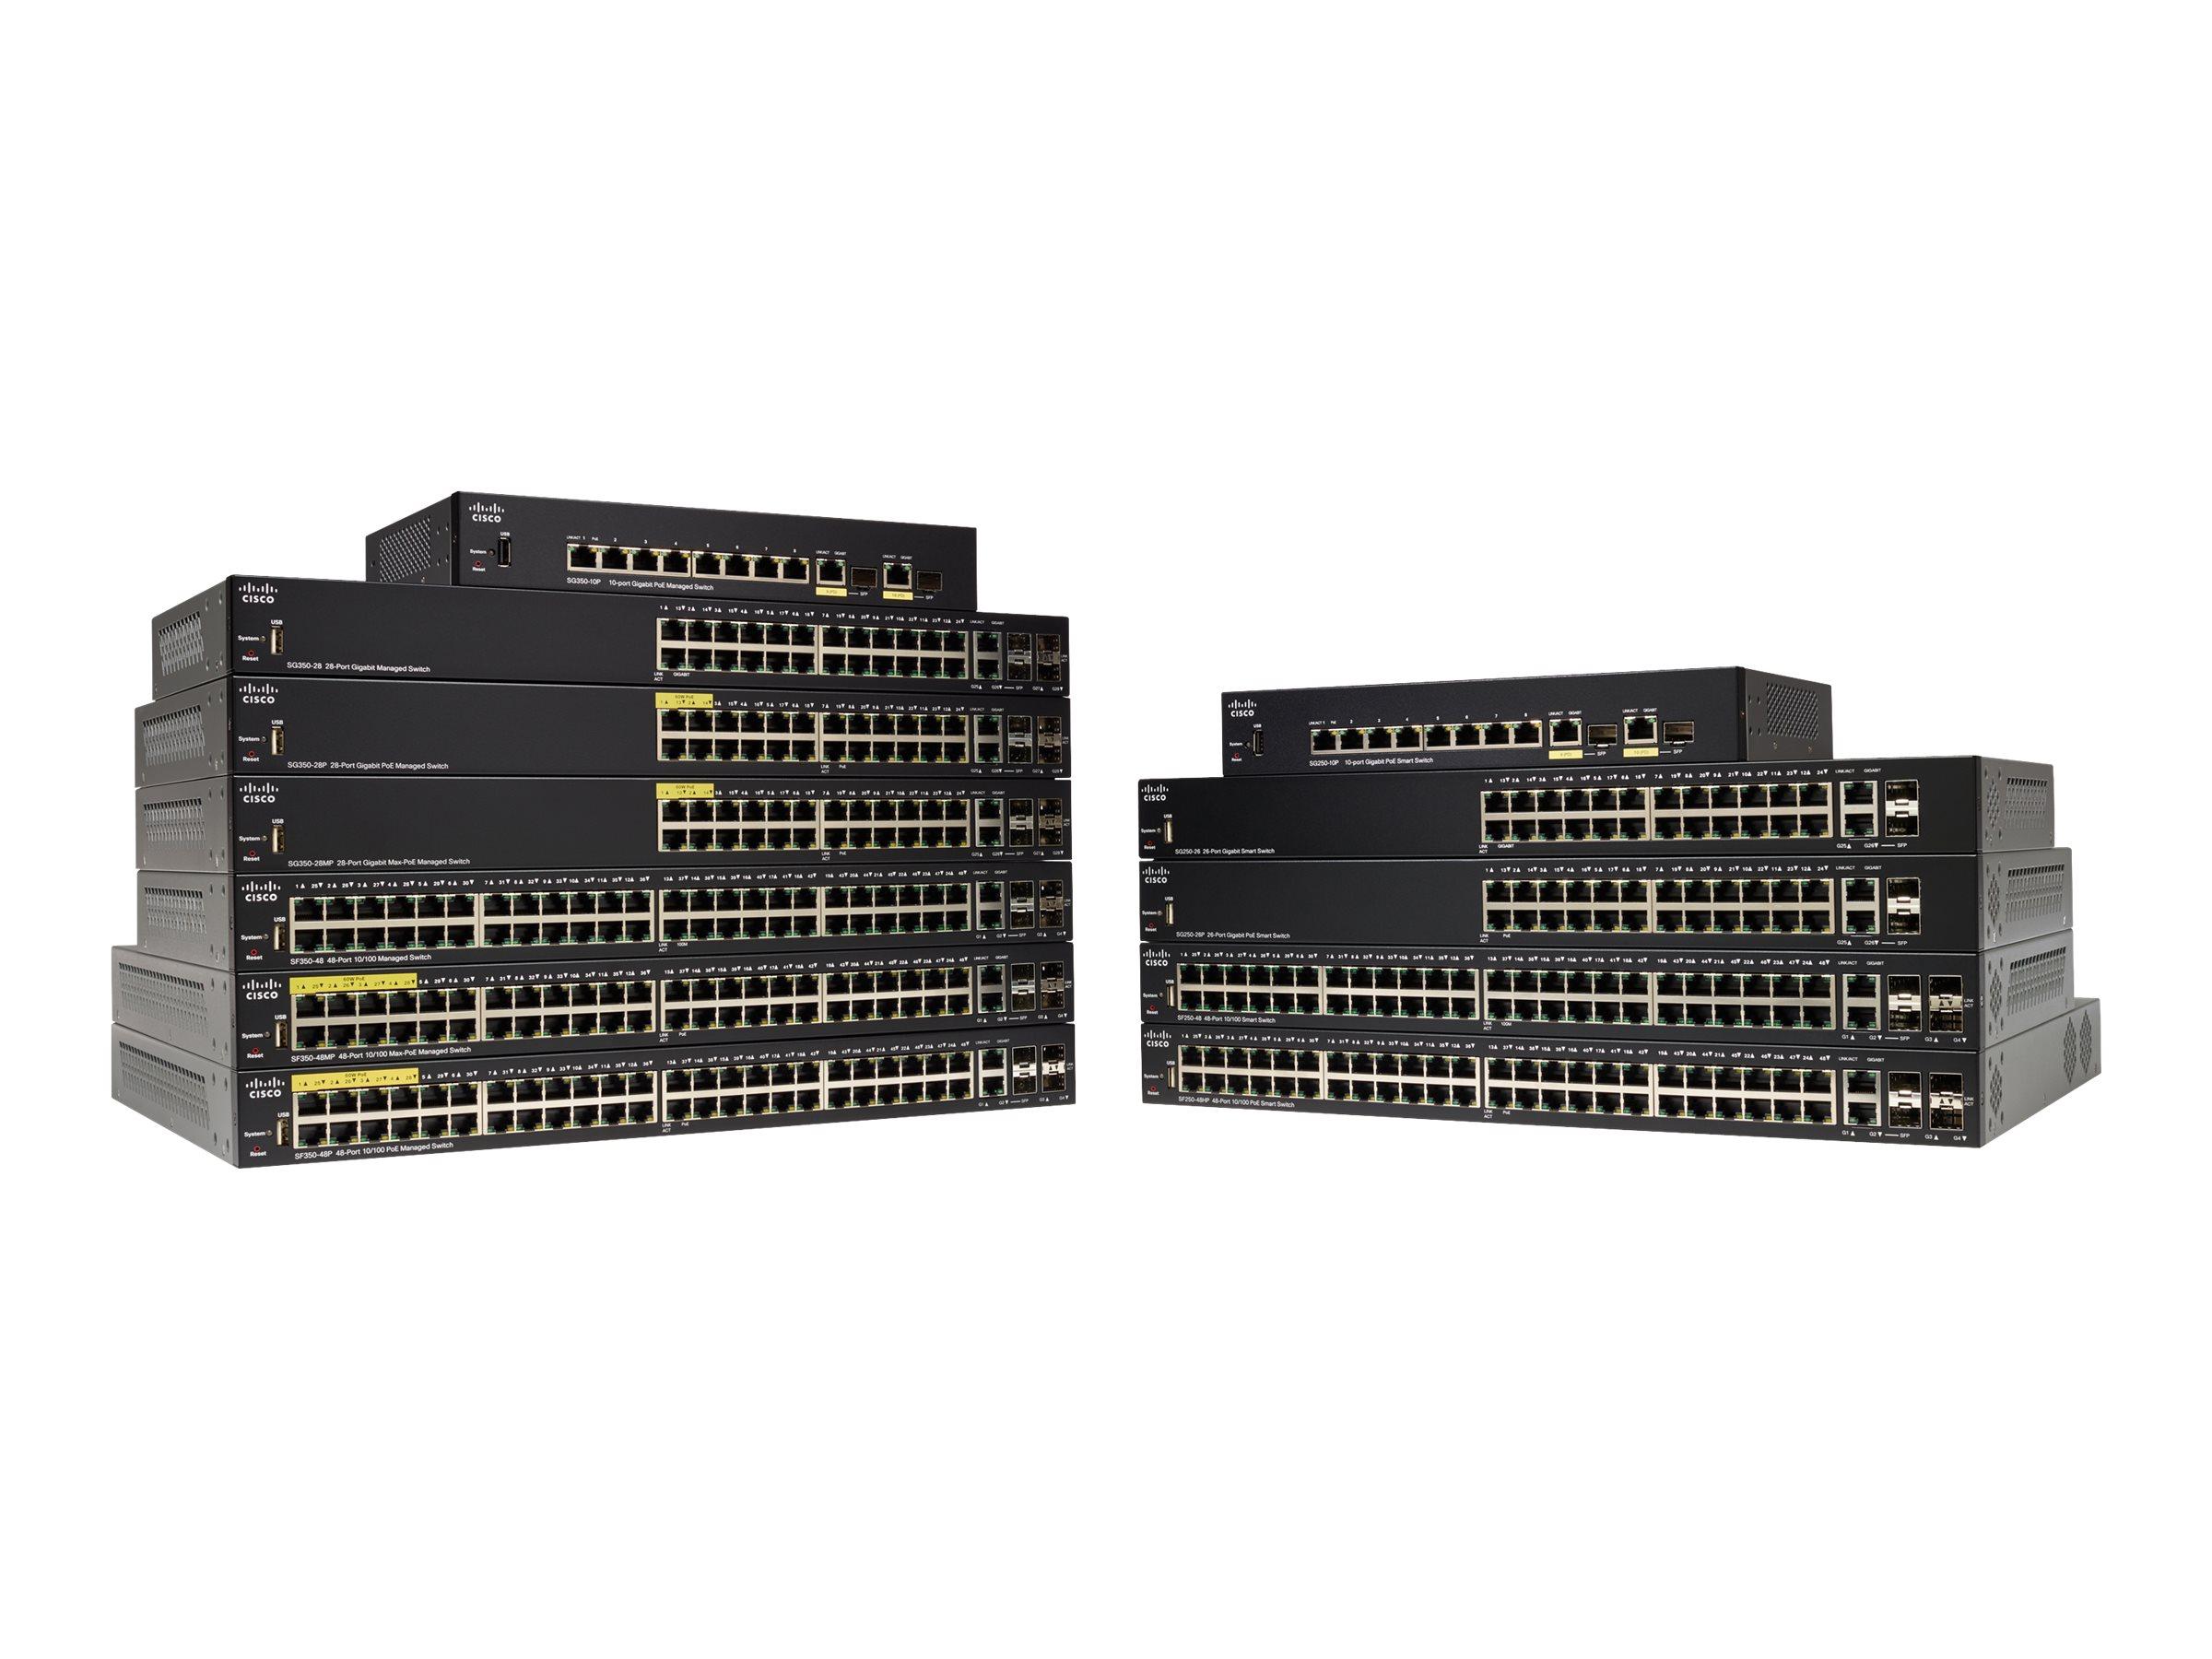 Cisco Small Business SF350-24 - Switch - L3 - verwaltet